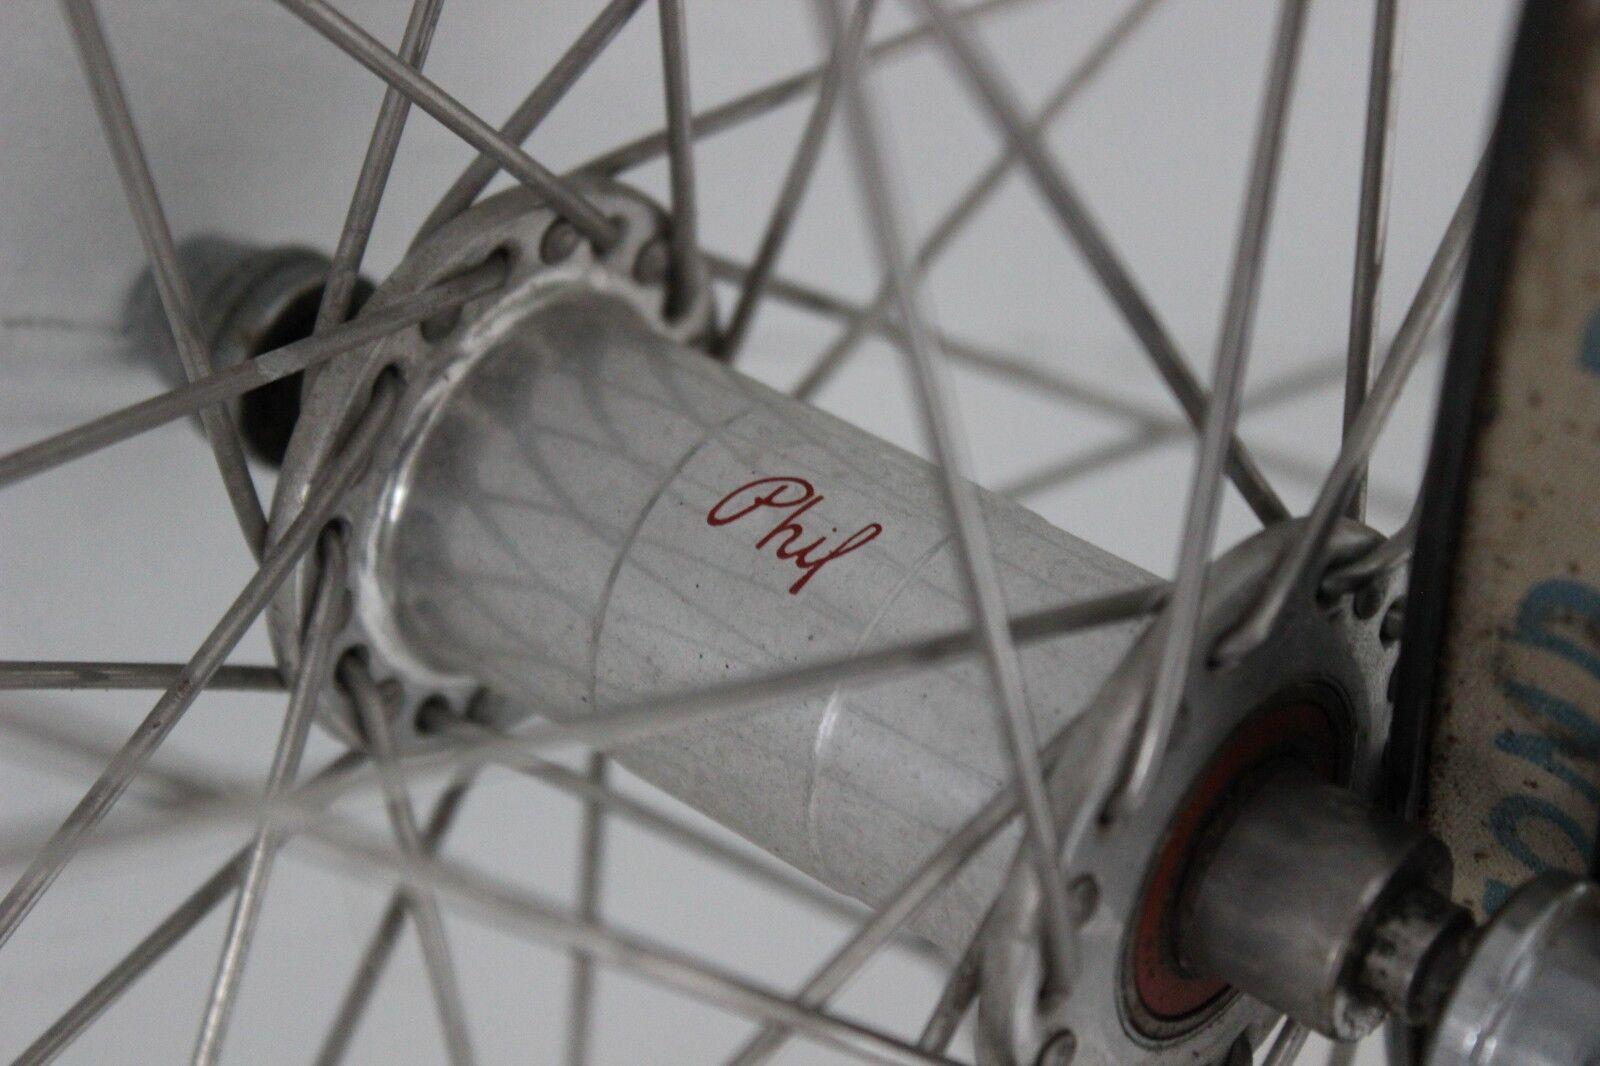 Phil Wood 40h Hubs Laced to 700c Aluminum Rims 100mm 130mm Road Bike Woods Wheel